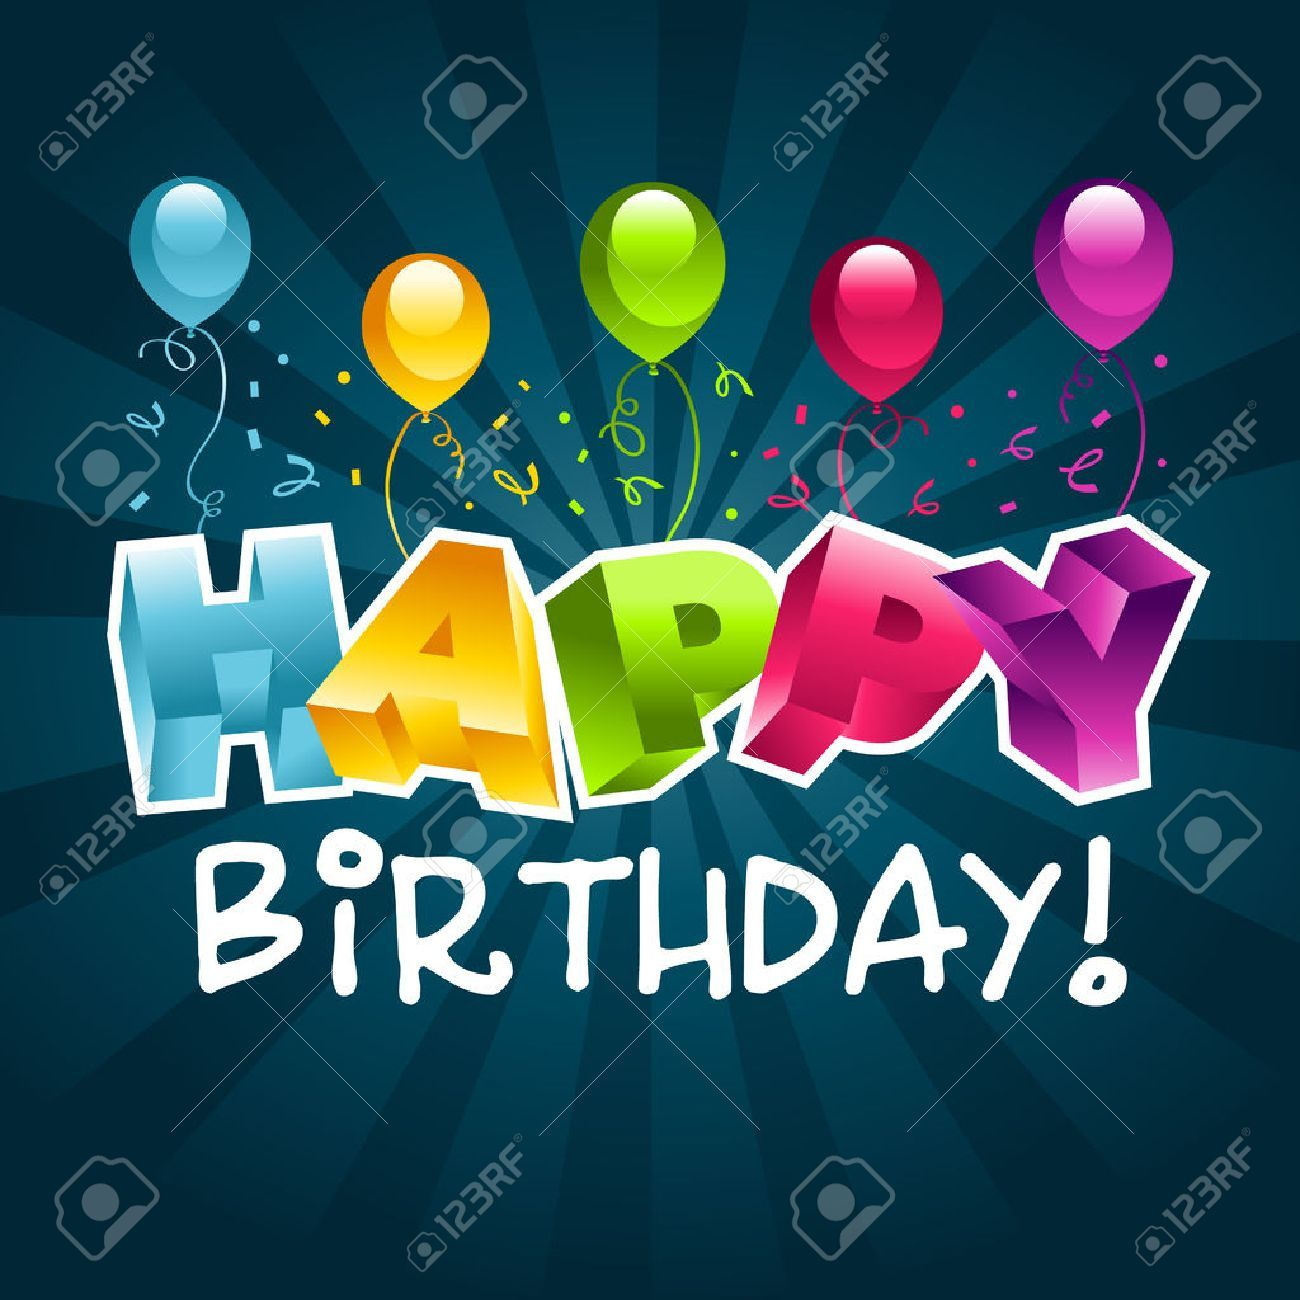 Alles Gute Zum Geburtstag Foto Alles Gute Geburtstag Alles Gute